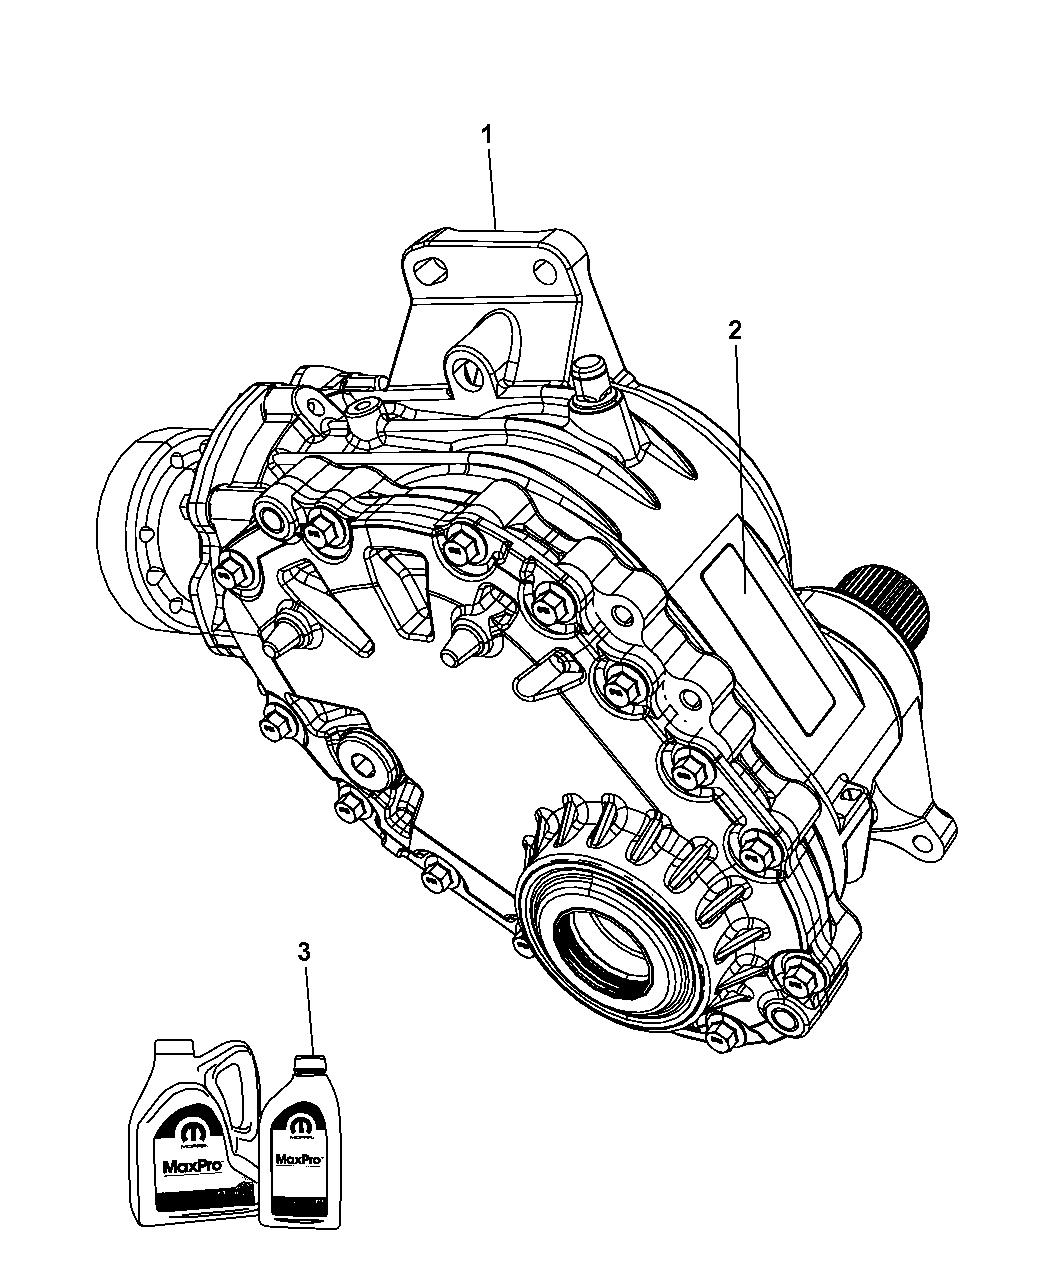 2010 Dodge Journey Power Transfer Unit & Identification